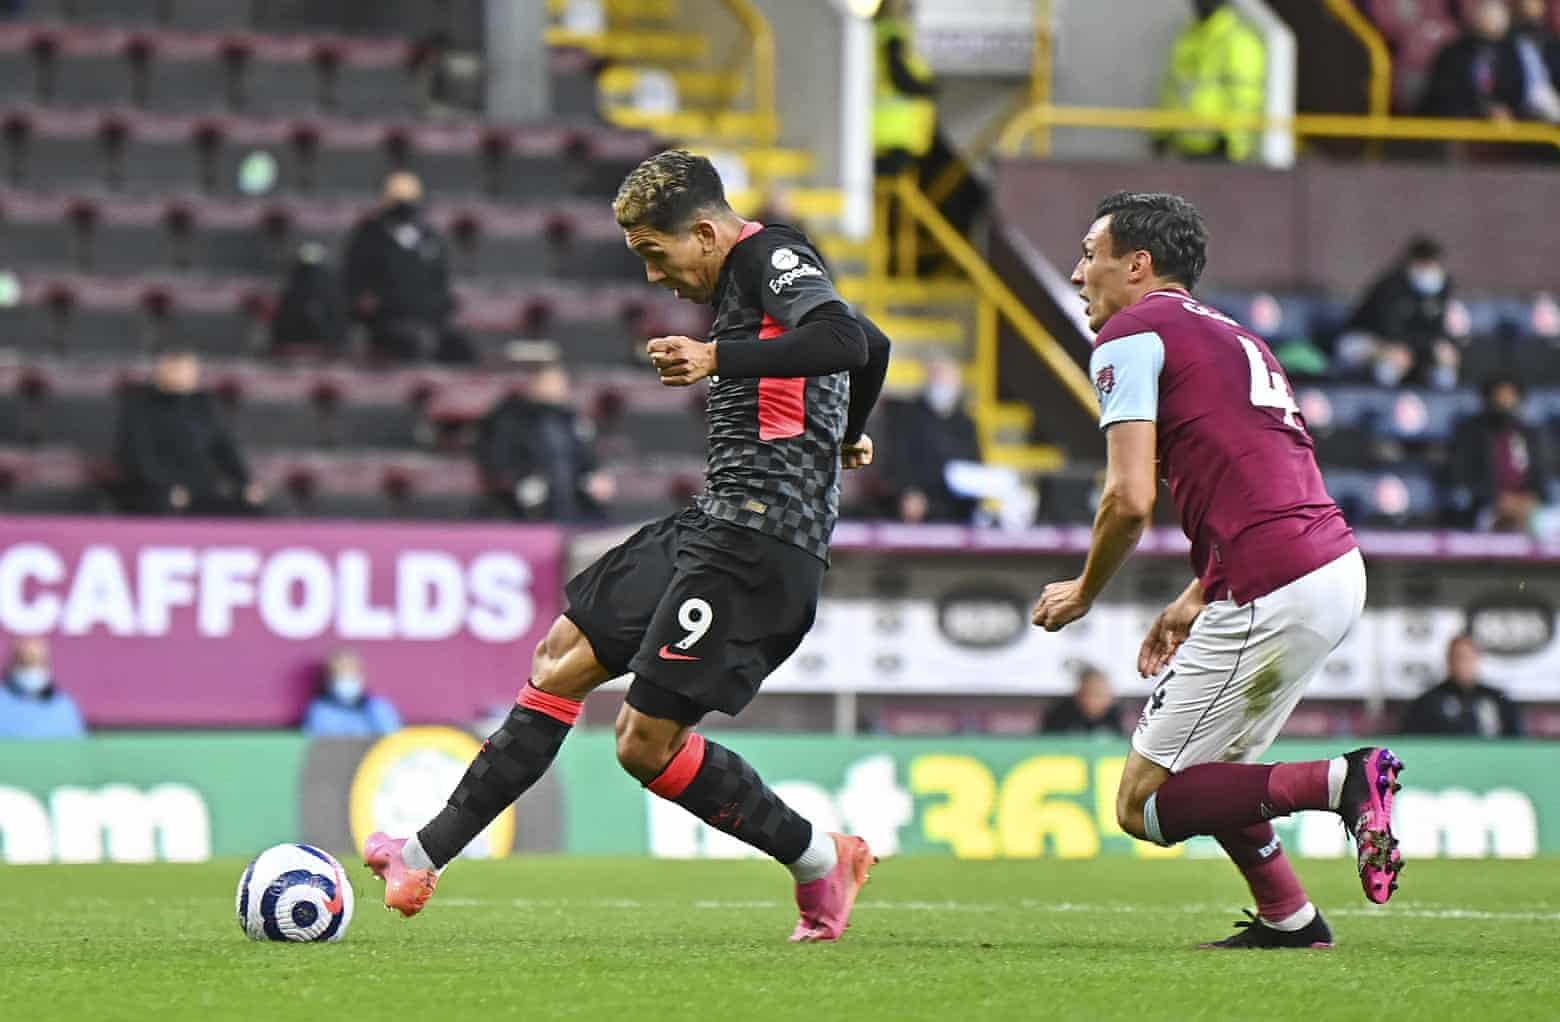 Firmino adalah pemilik gol pembuka Liverpool dalam kemenangan penting melawan Burnley kemarin 19/5.  Foto: Reuters